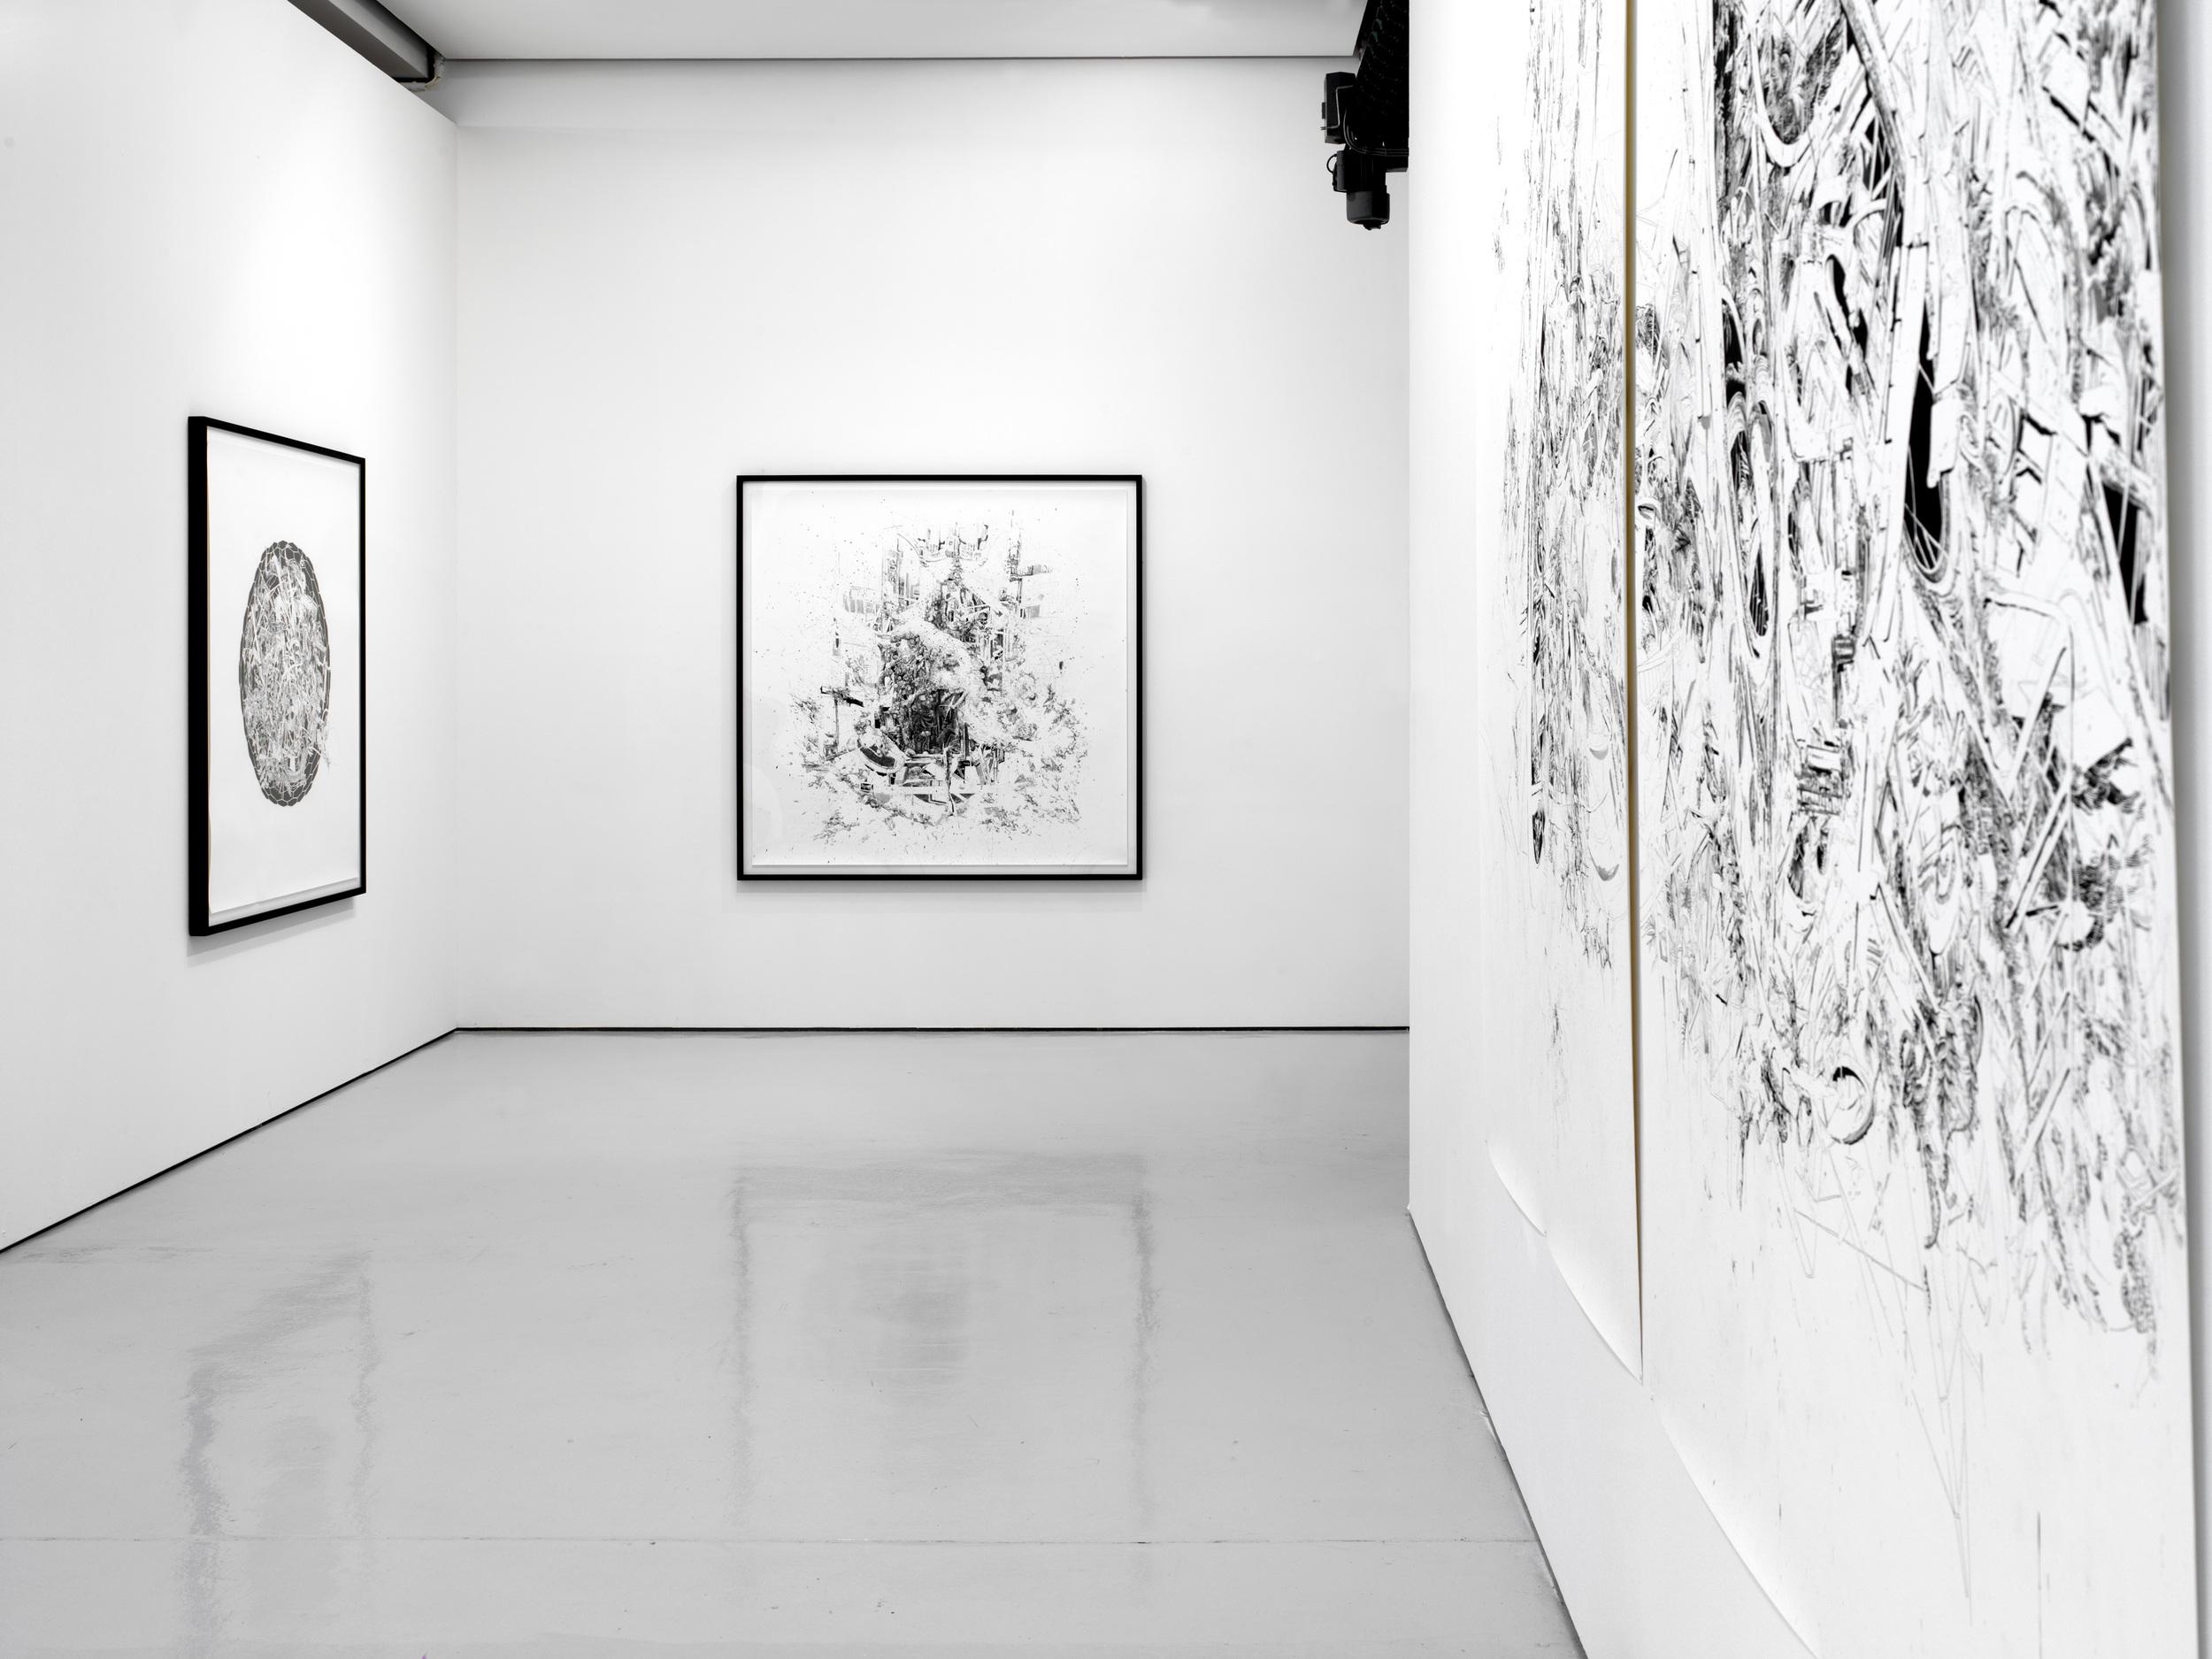 exhibitionView_drawing_a_Universe_Kai10_Düsseldorf2013.jpg